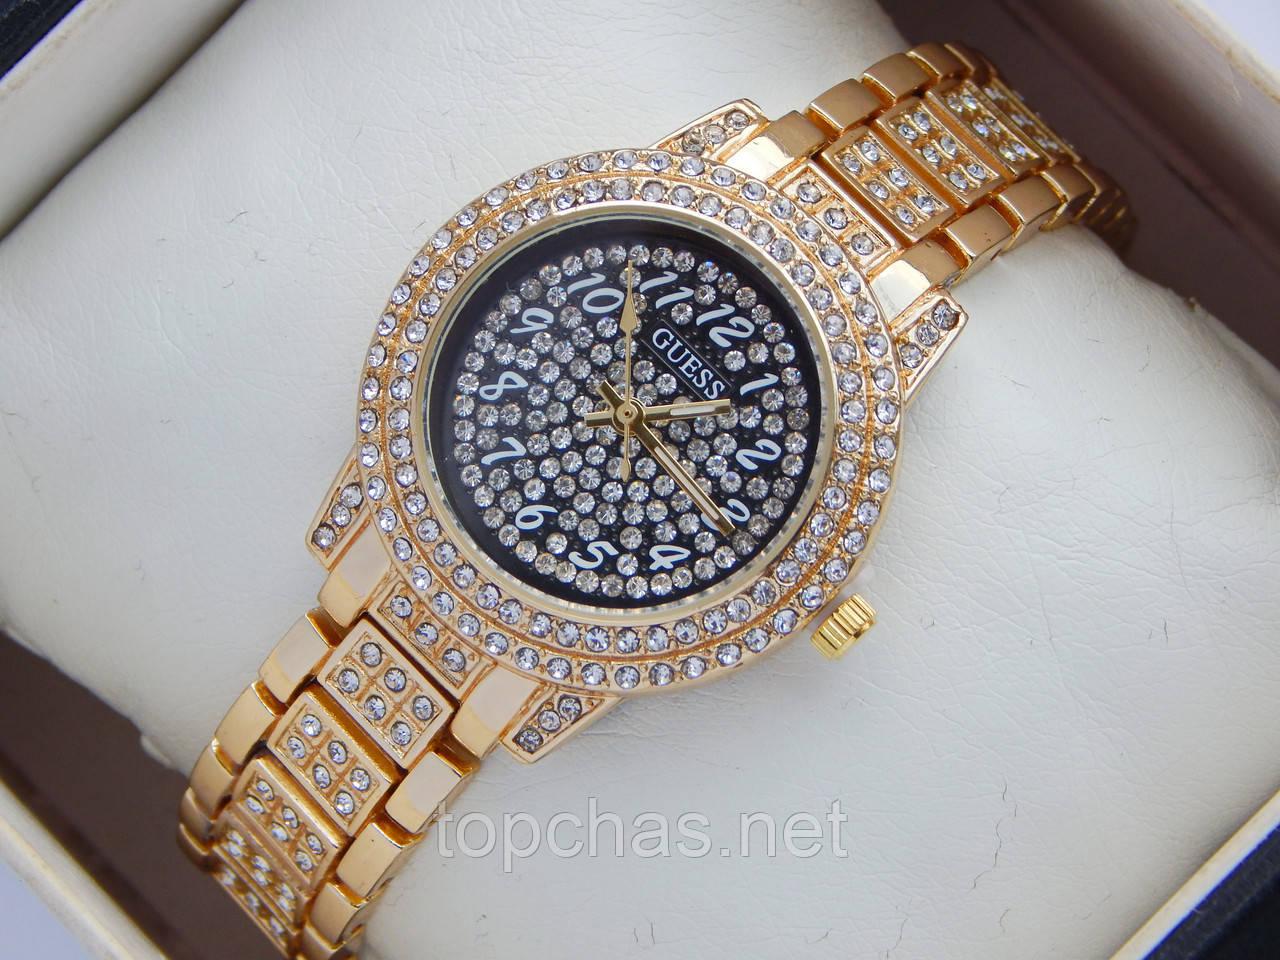 d1d56a5f Женские кварцевые наручные часы Guess в стразах - черный циферблат - Top  Chas - Интернет магазин